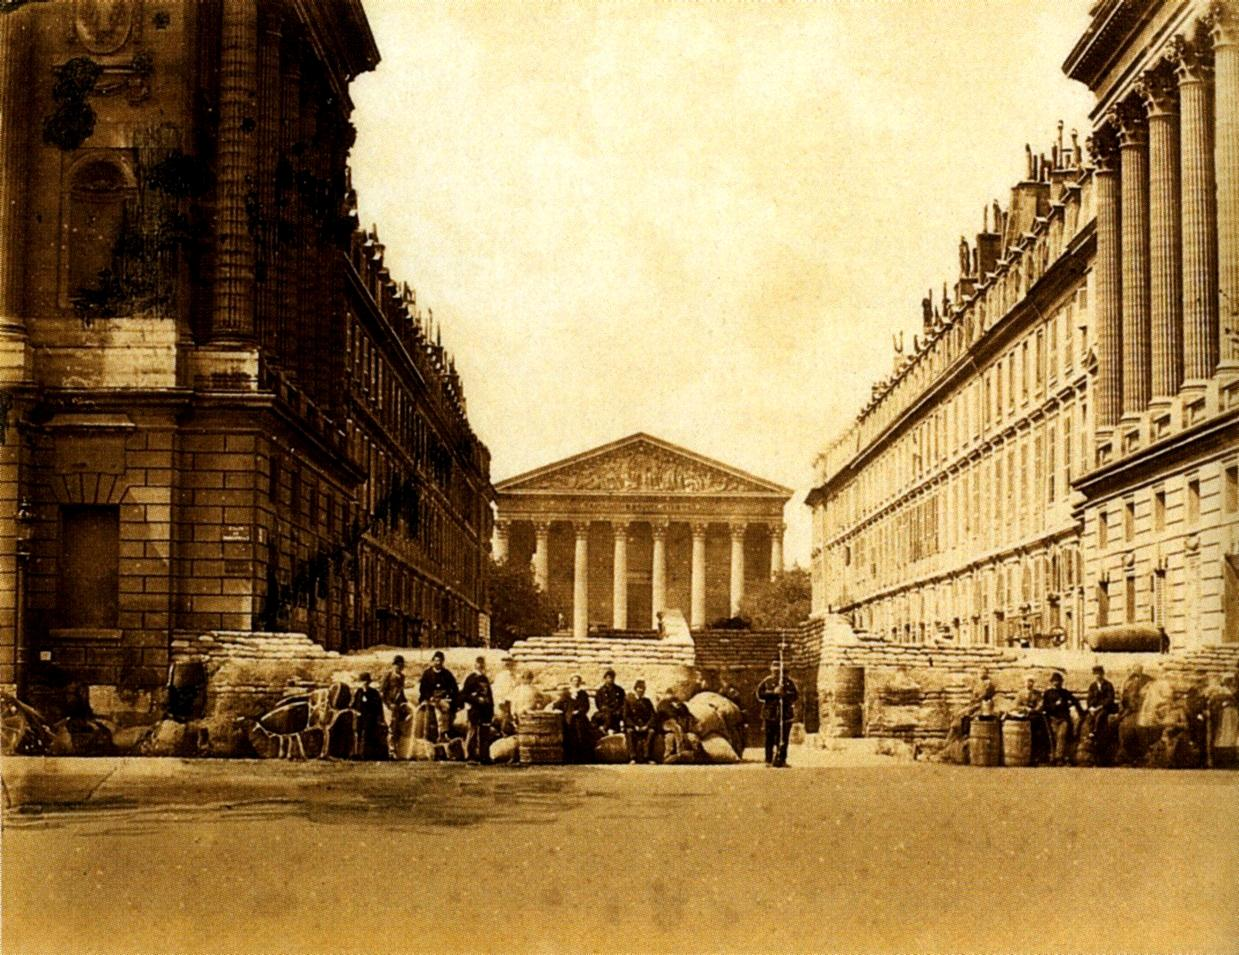 Barricada davant de l'església de la Madeleine